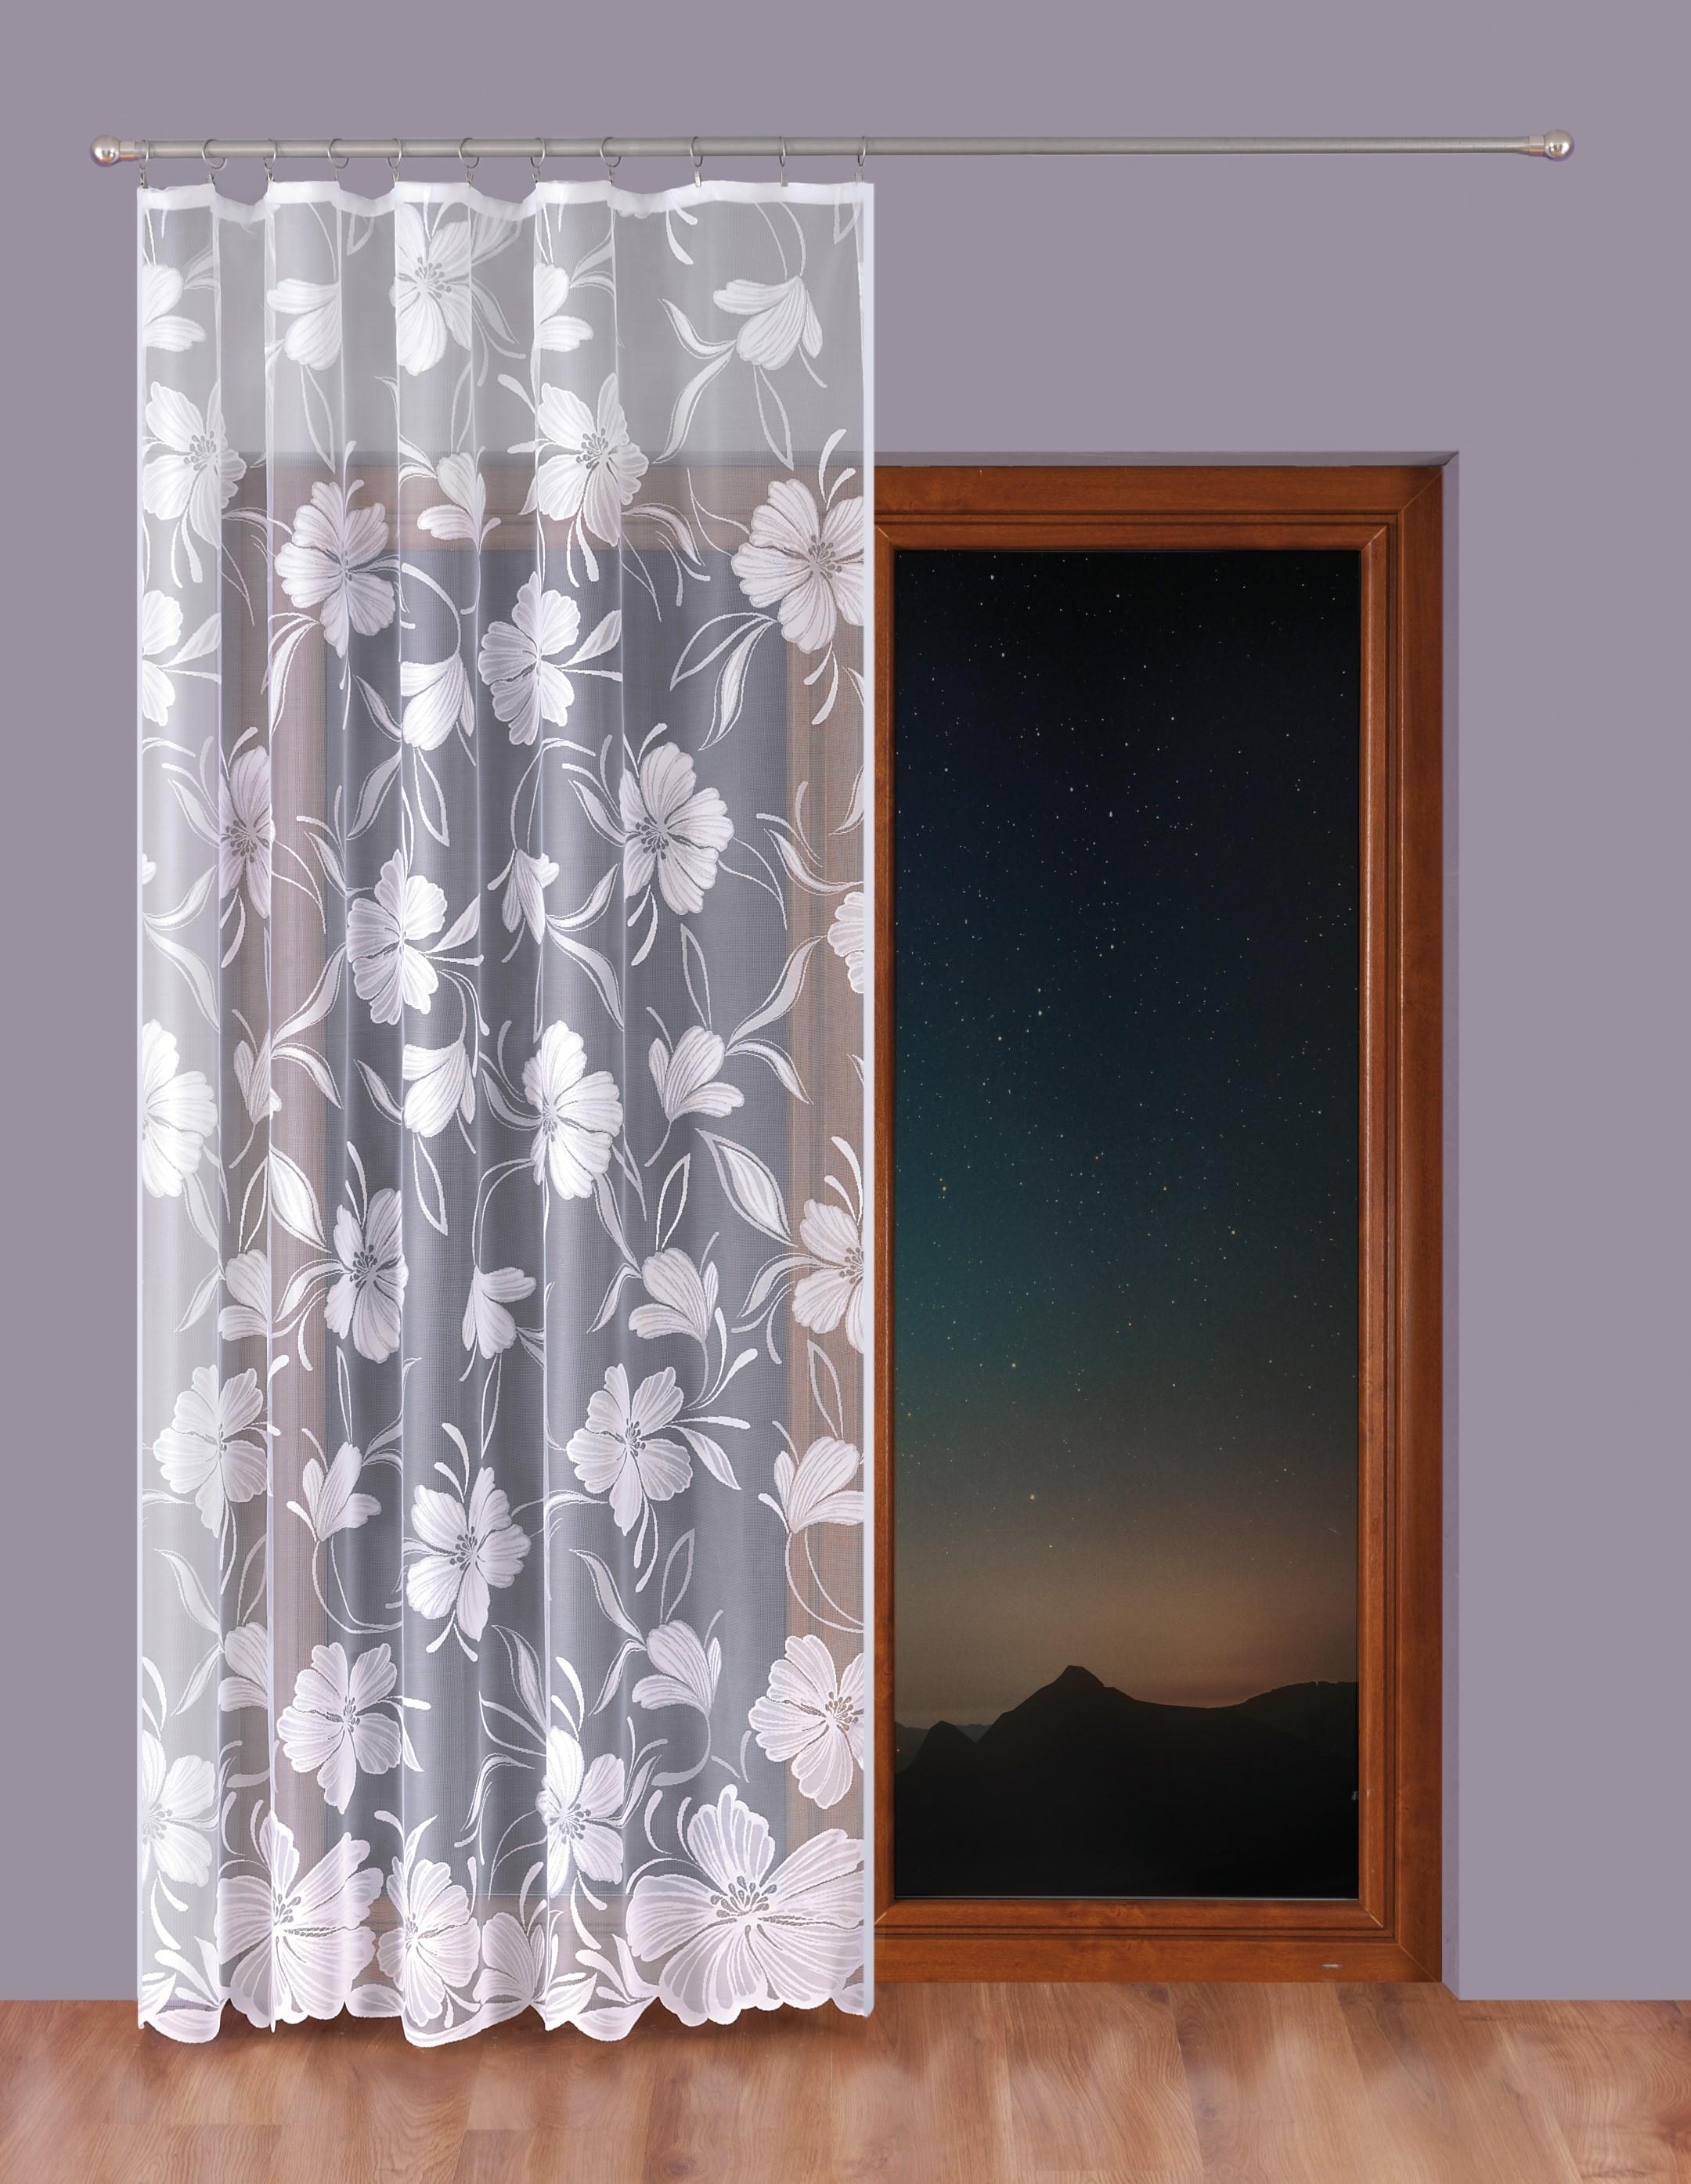 Шторы Primavera Классические шторы Gerry Цвет: Белый шторы primavera классические шторы larry цвет белый